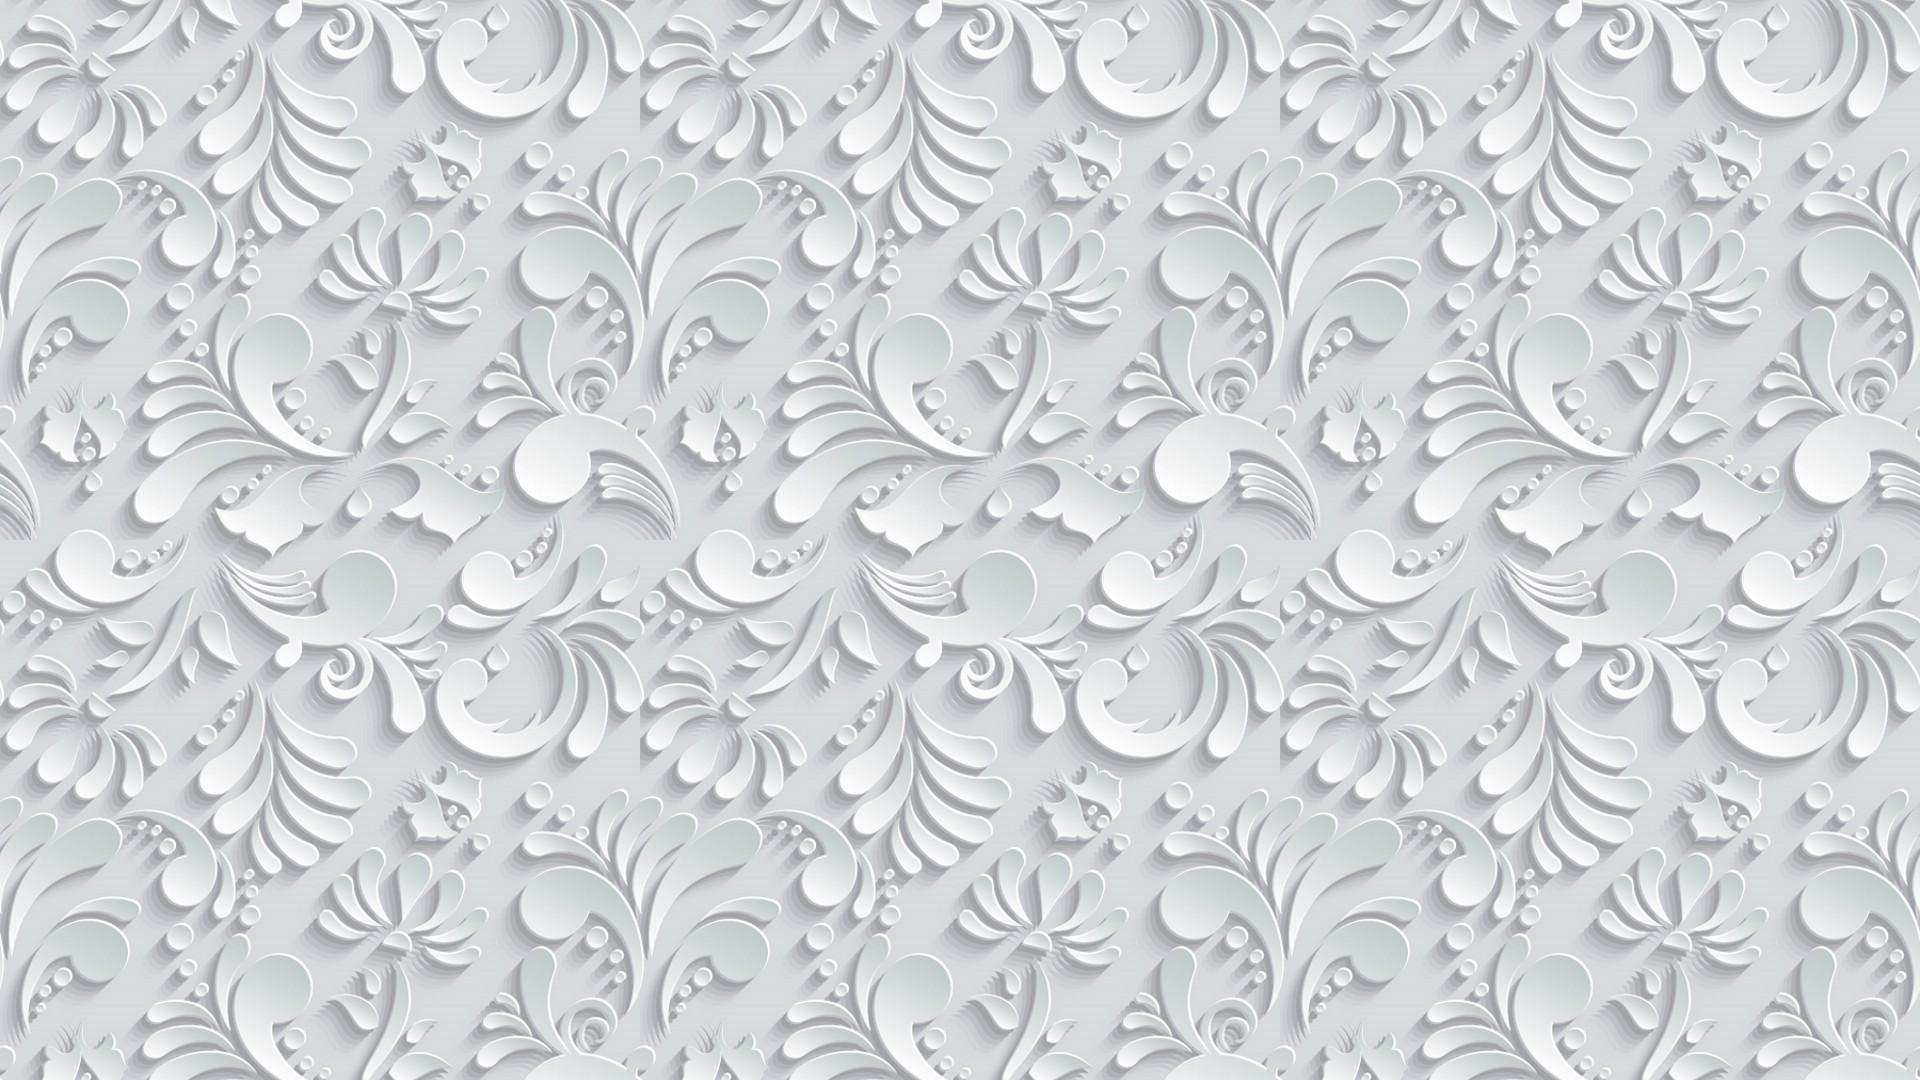 Vector Floral 3d Seamless Pattern on grey background wallpaper 4K Ultra HD  Desktop